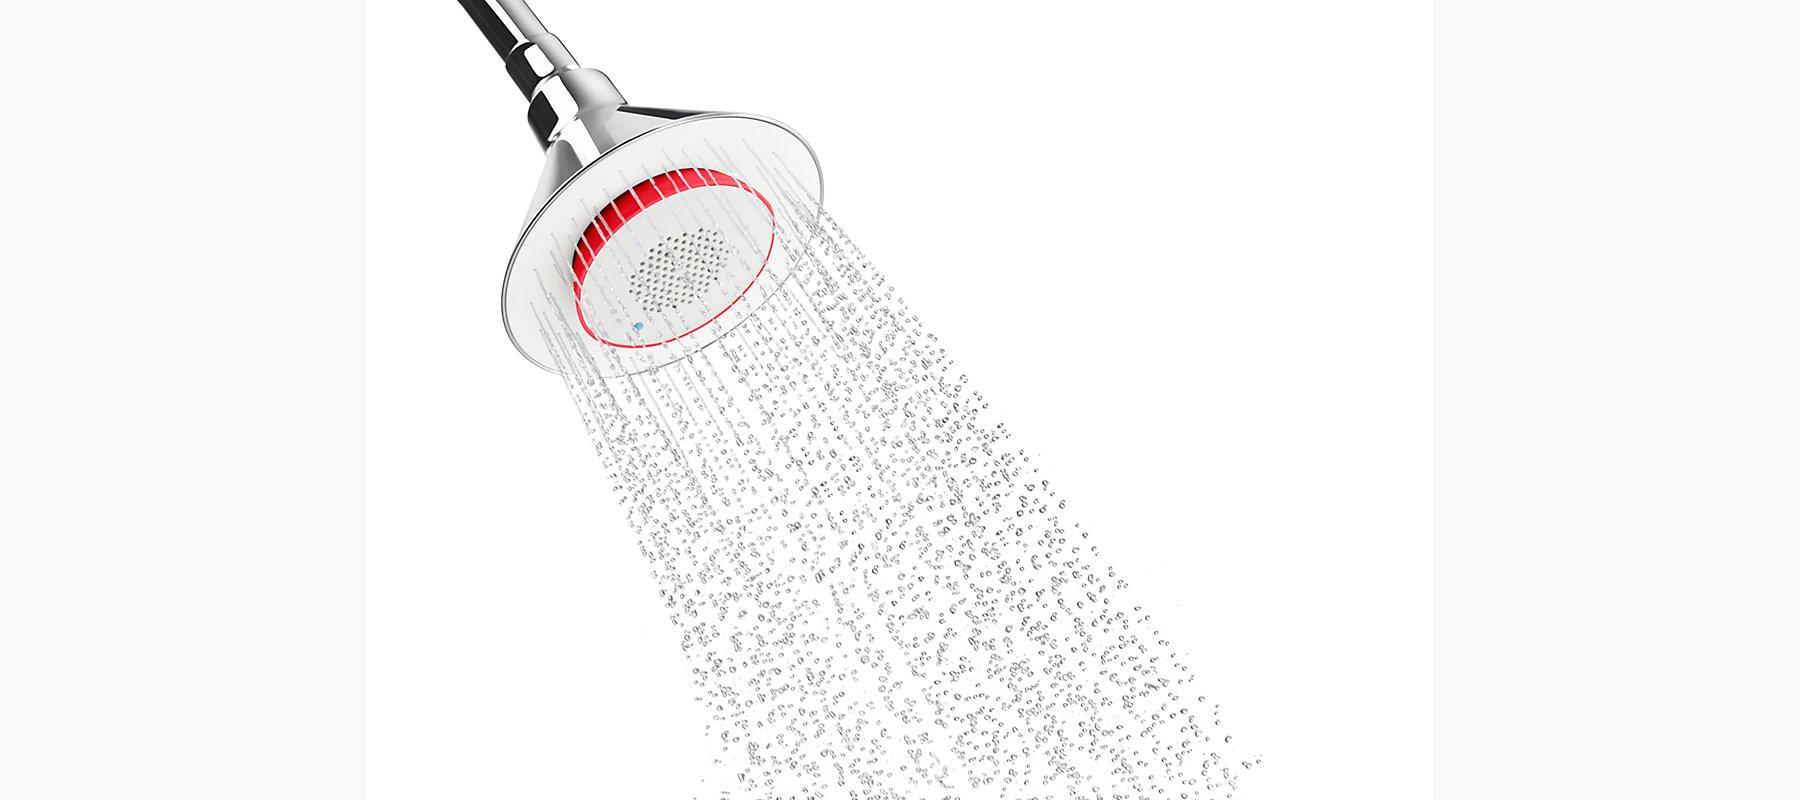 Kohler's Moxie® Single-Function Showerhead with Wireless Speaker | Photo Source: Kohler